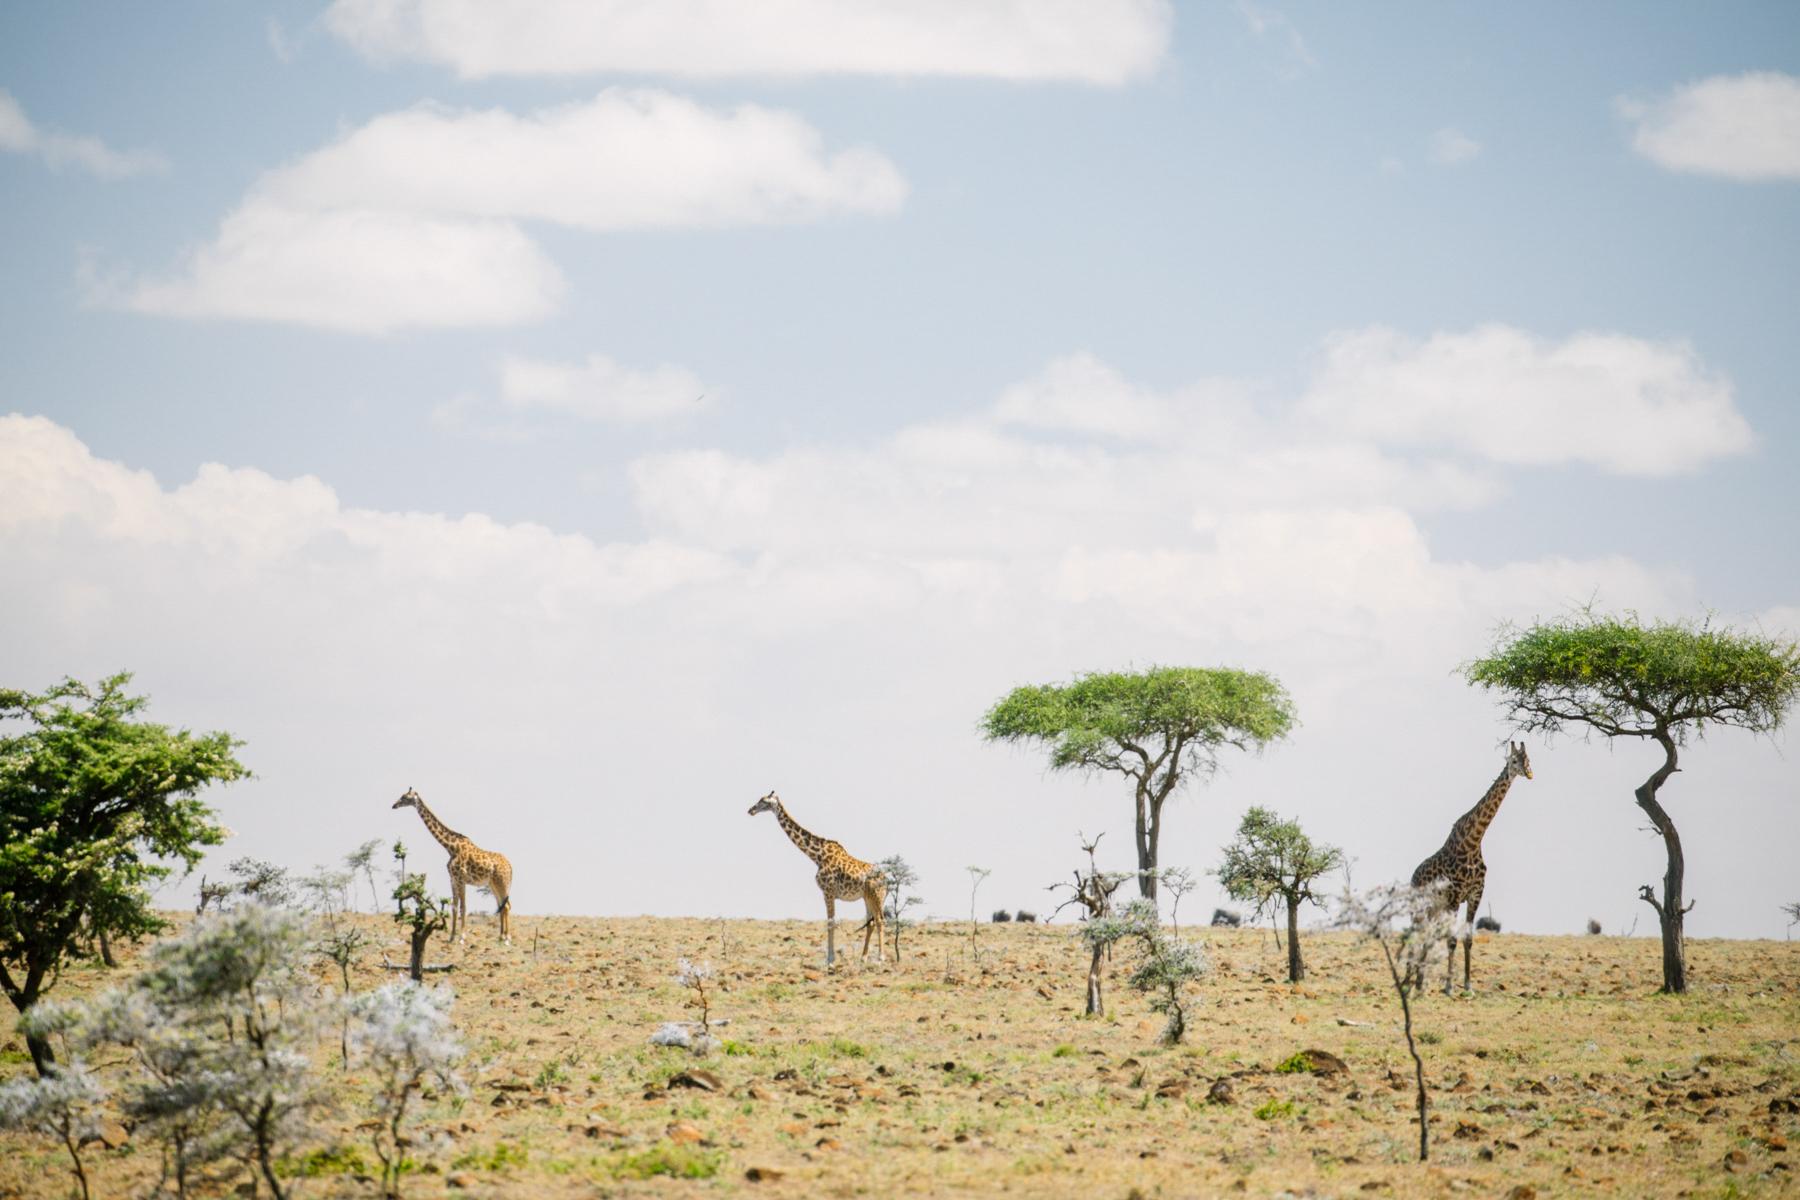 KenyaFeb2019_Safari-103.jpg